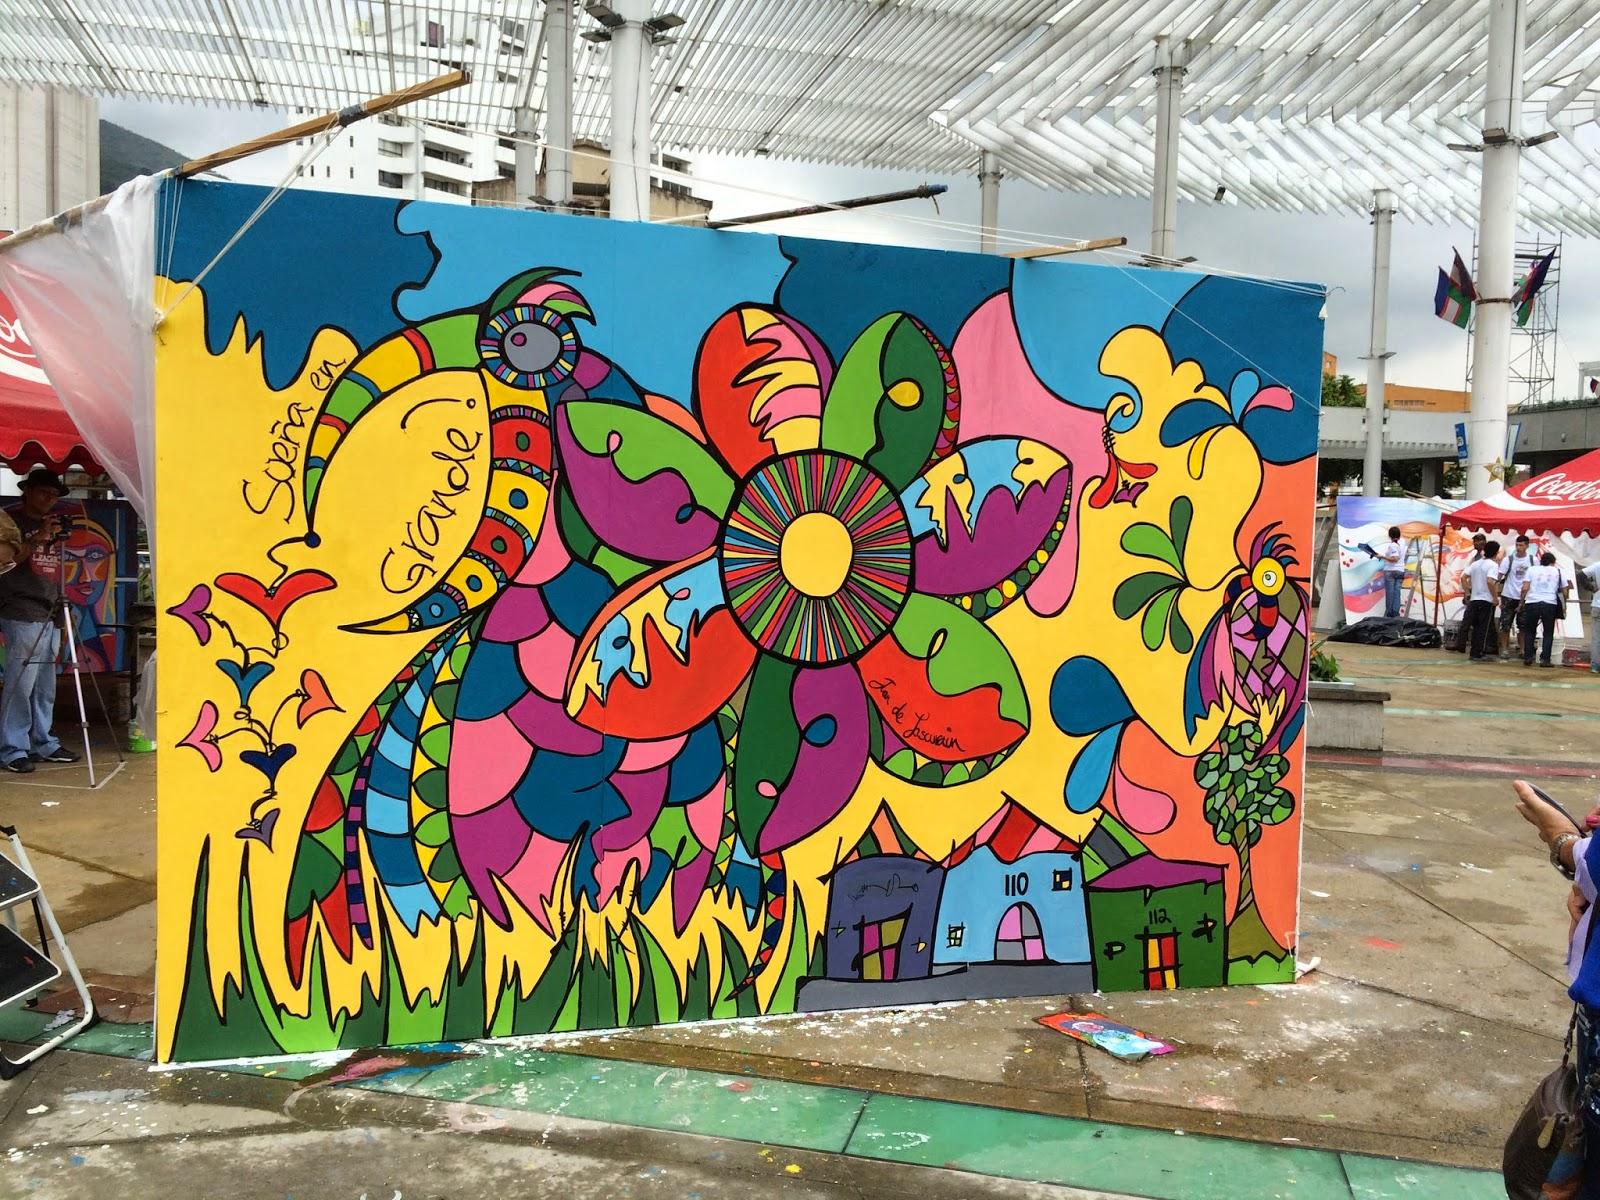 mosaico creativo de fj mosaic art ii bienal de muralismo